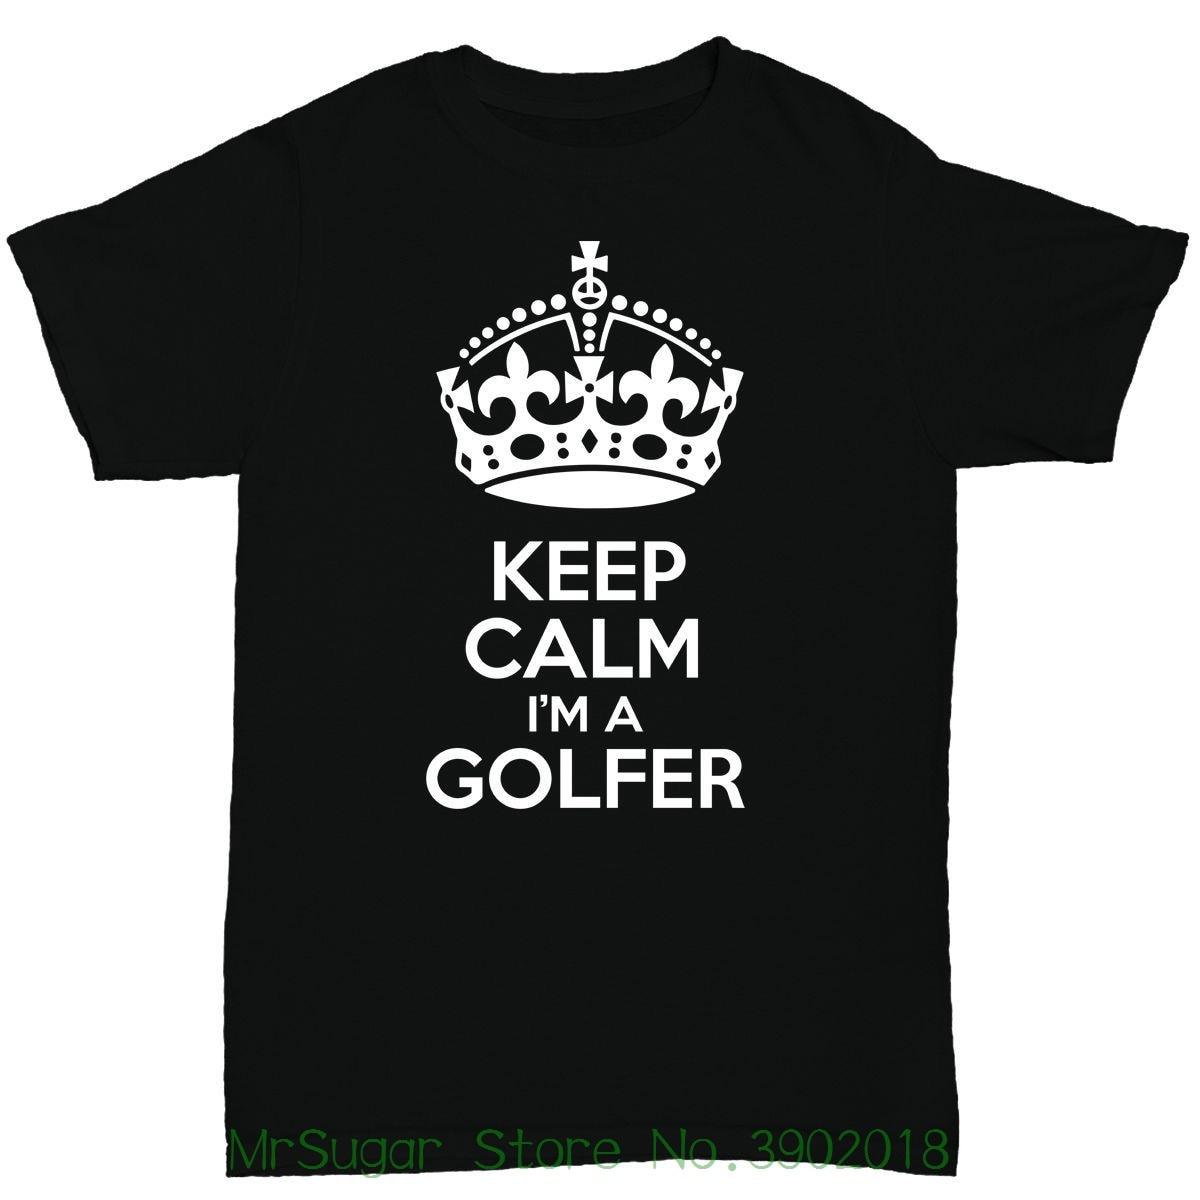 Keep Calm Im A Golfer Mens T Shirt Golfer Golfing Birthday Funny Humour New 2018 Fashion T Shirt Men